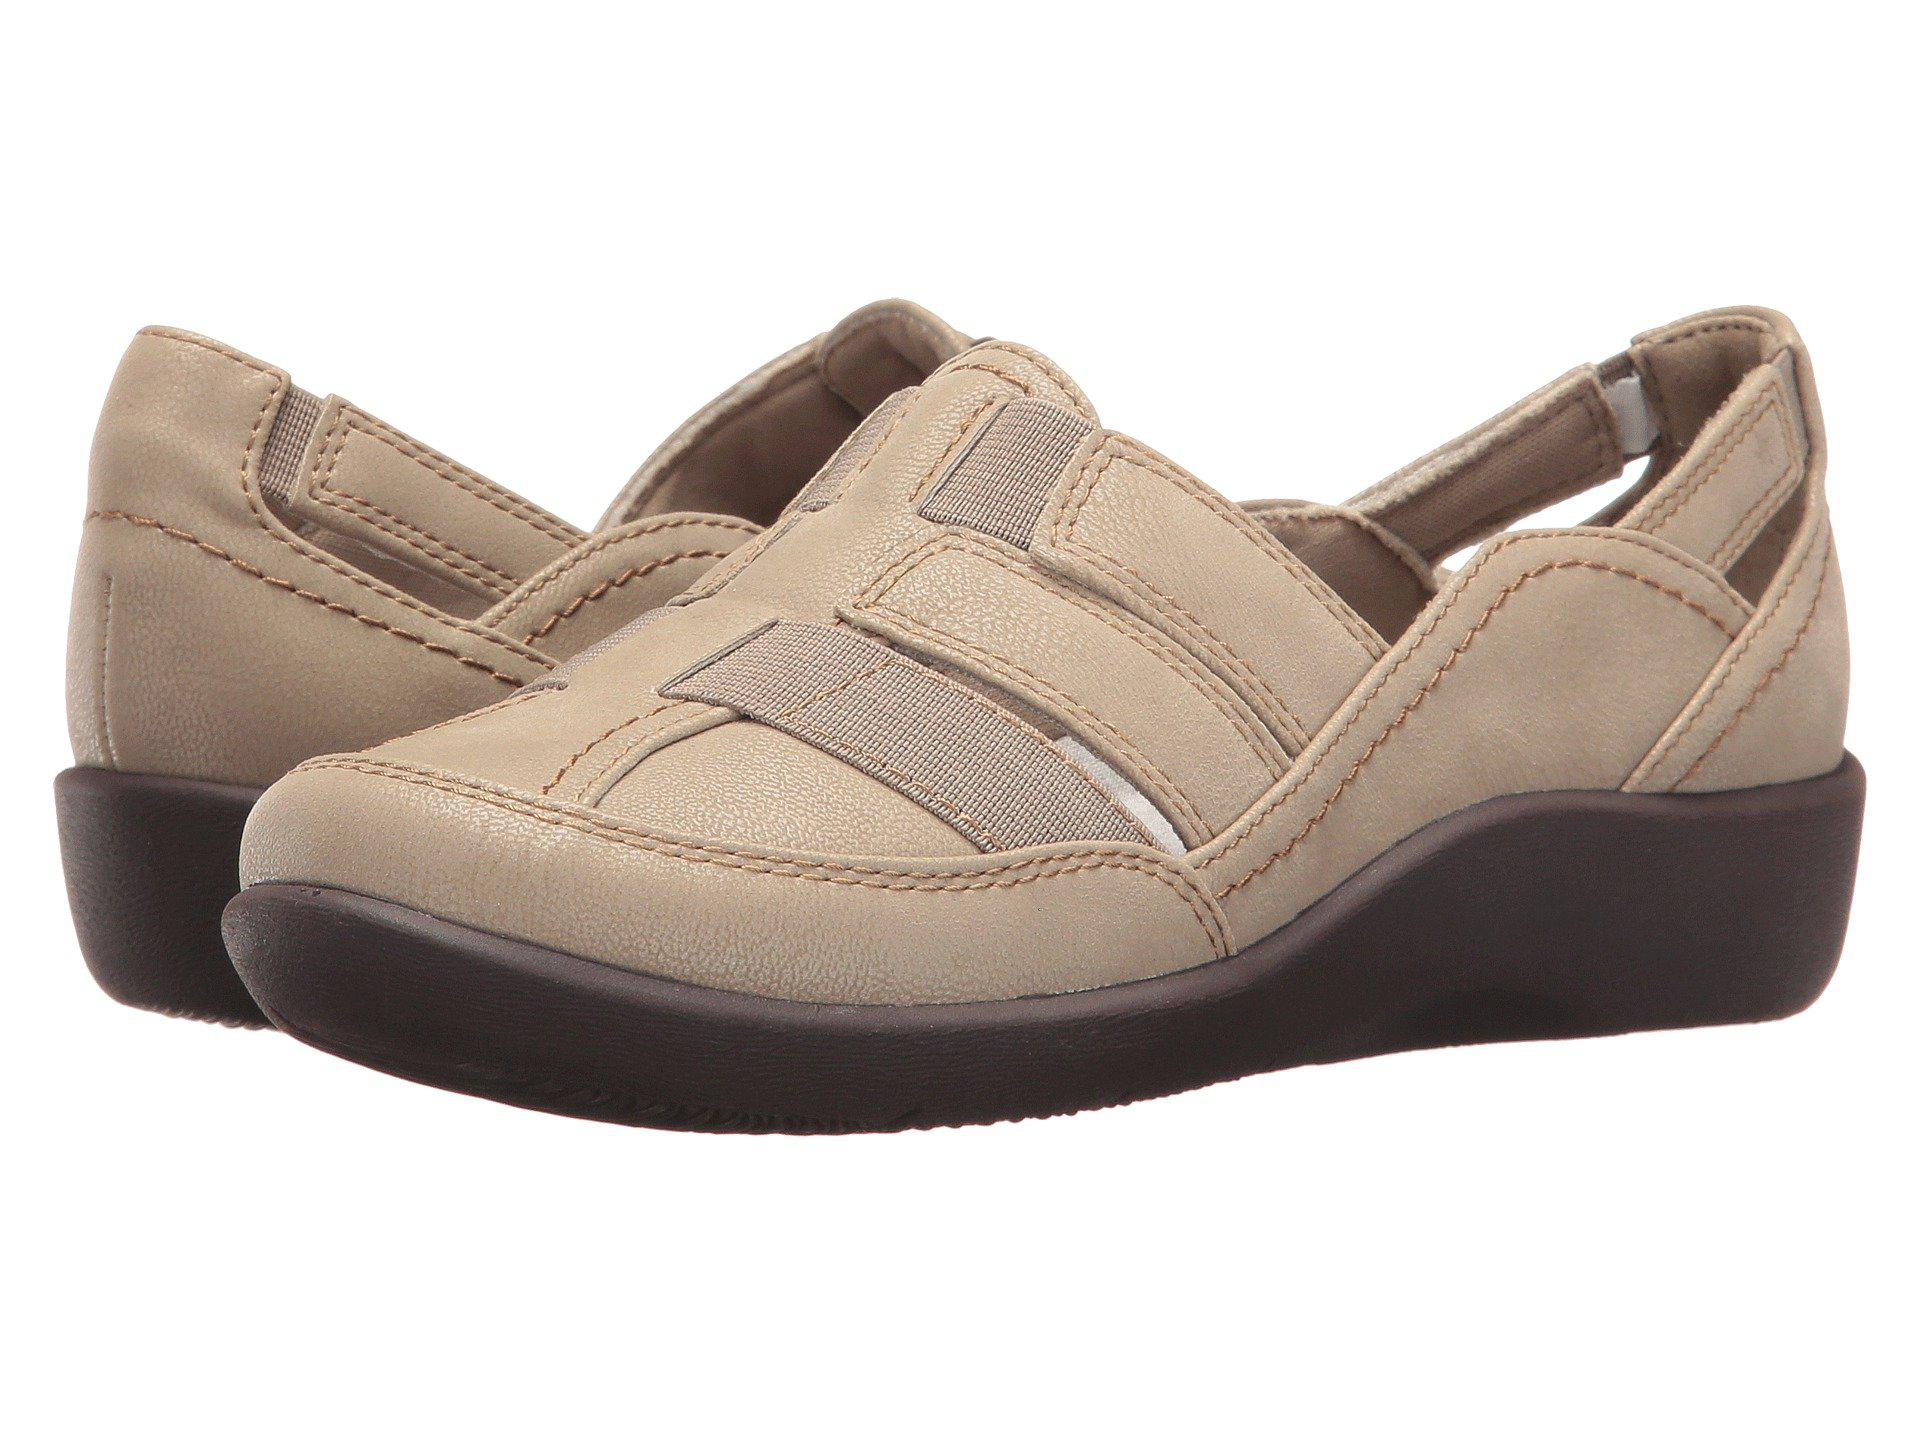 bba63cd6466 Lyst - Clarks Sillian Stork (navy) Women s Sandals in Brown